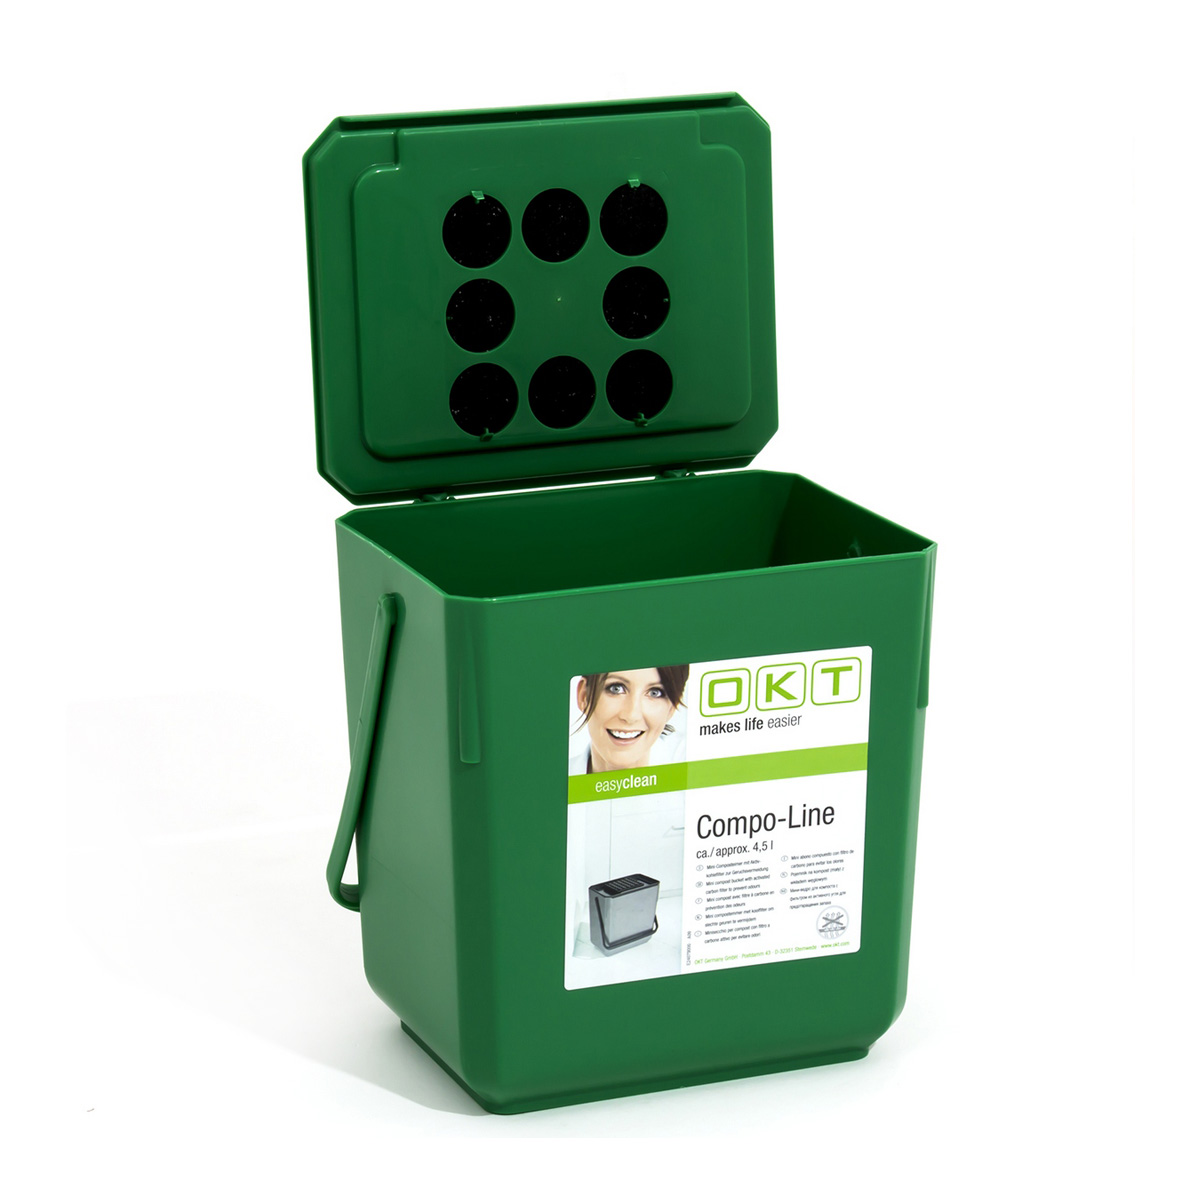 mini kompost eimer mit aktivkohlefilter 4 5 liter komposter haushaltskomposter ebay. Black Bedroom Furniture Sets. Home Design Ideas